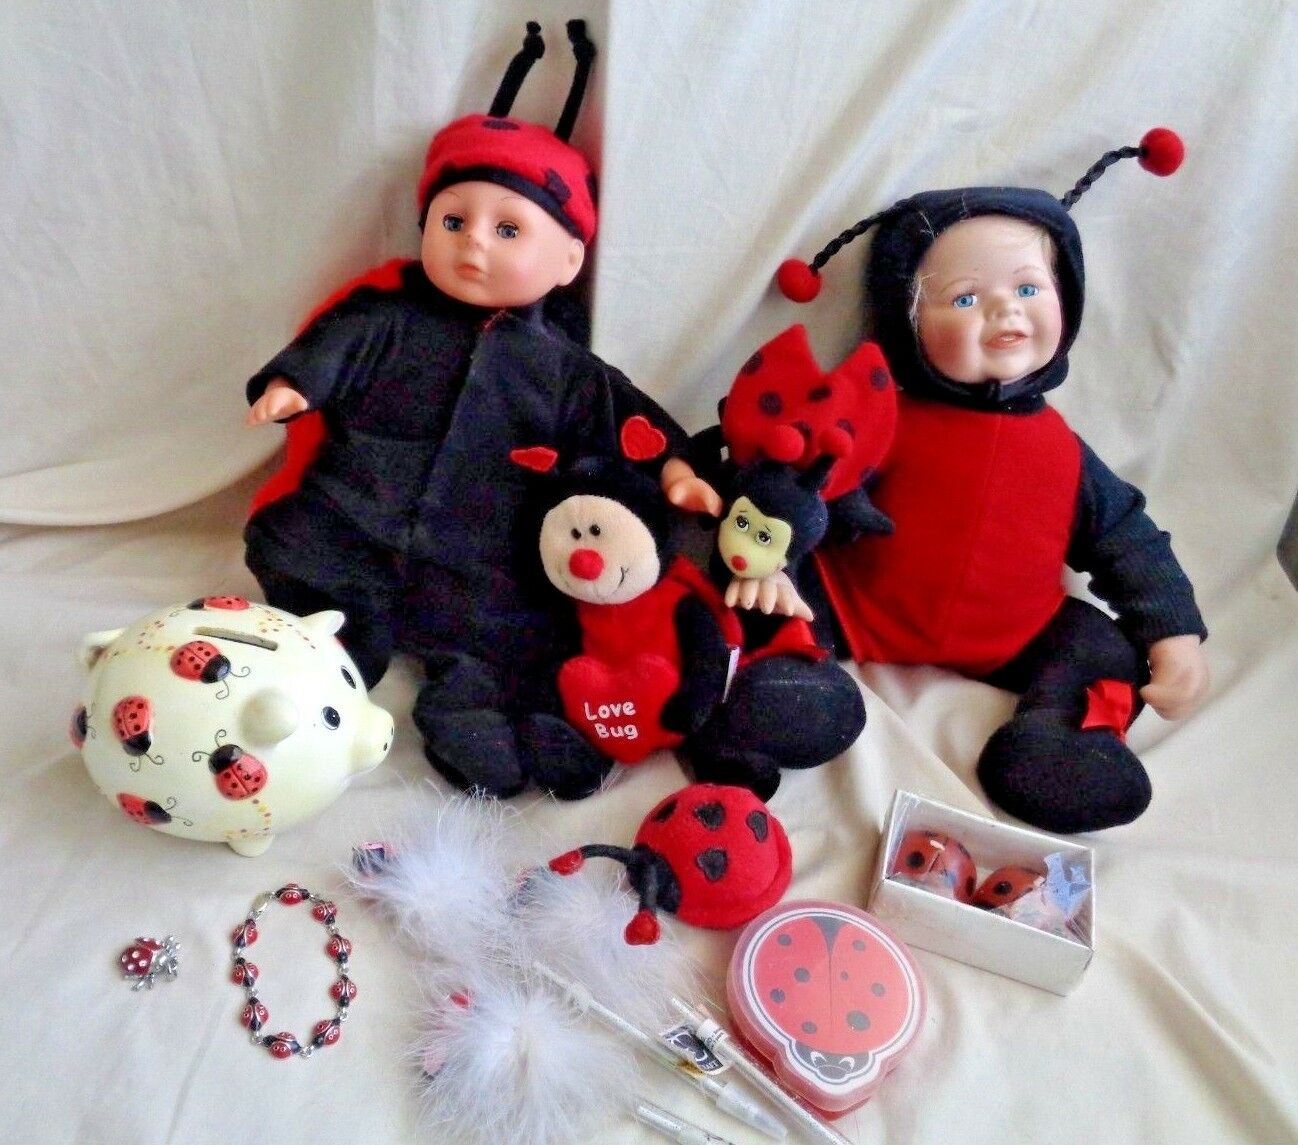 Ladybug Collection 2 Dolls 1 Plush Bracelet Bank Pencils Cards Candles Toy